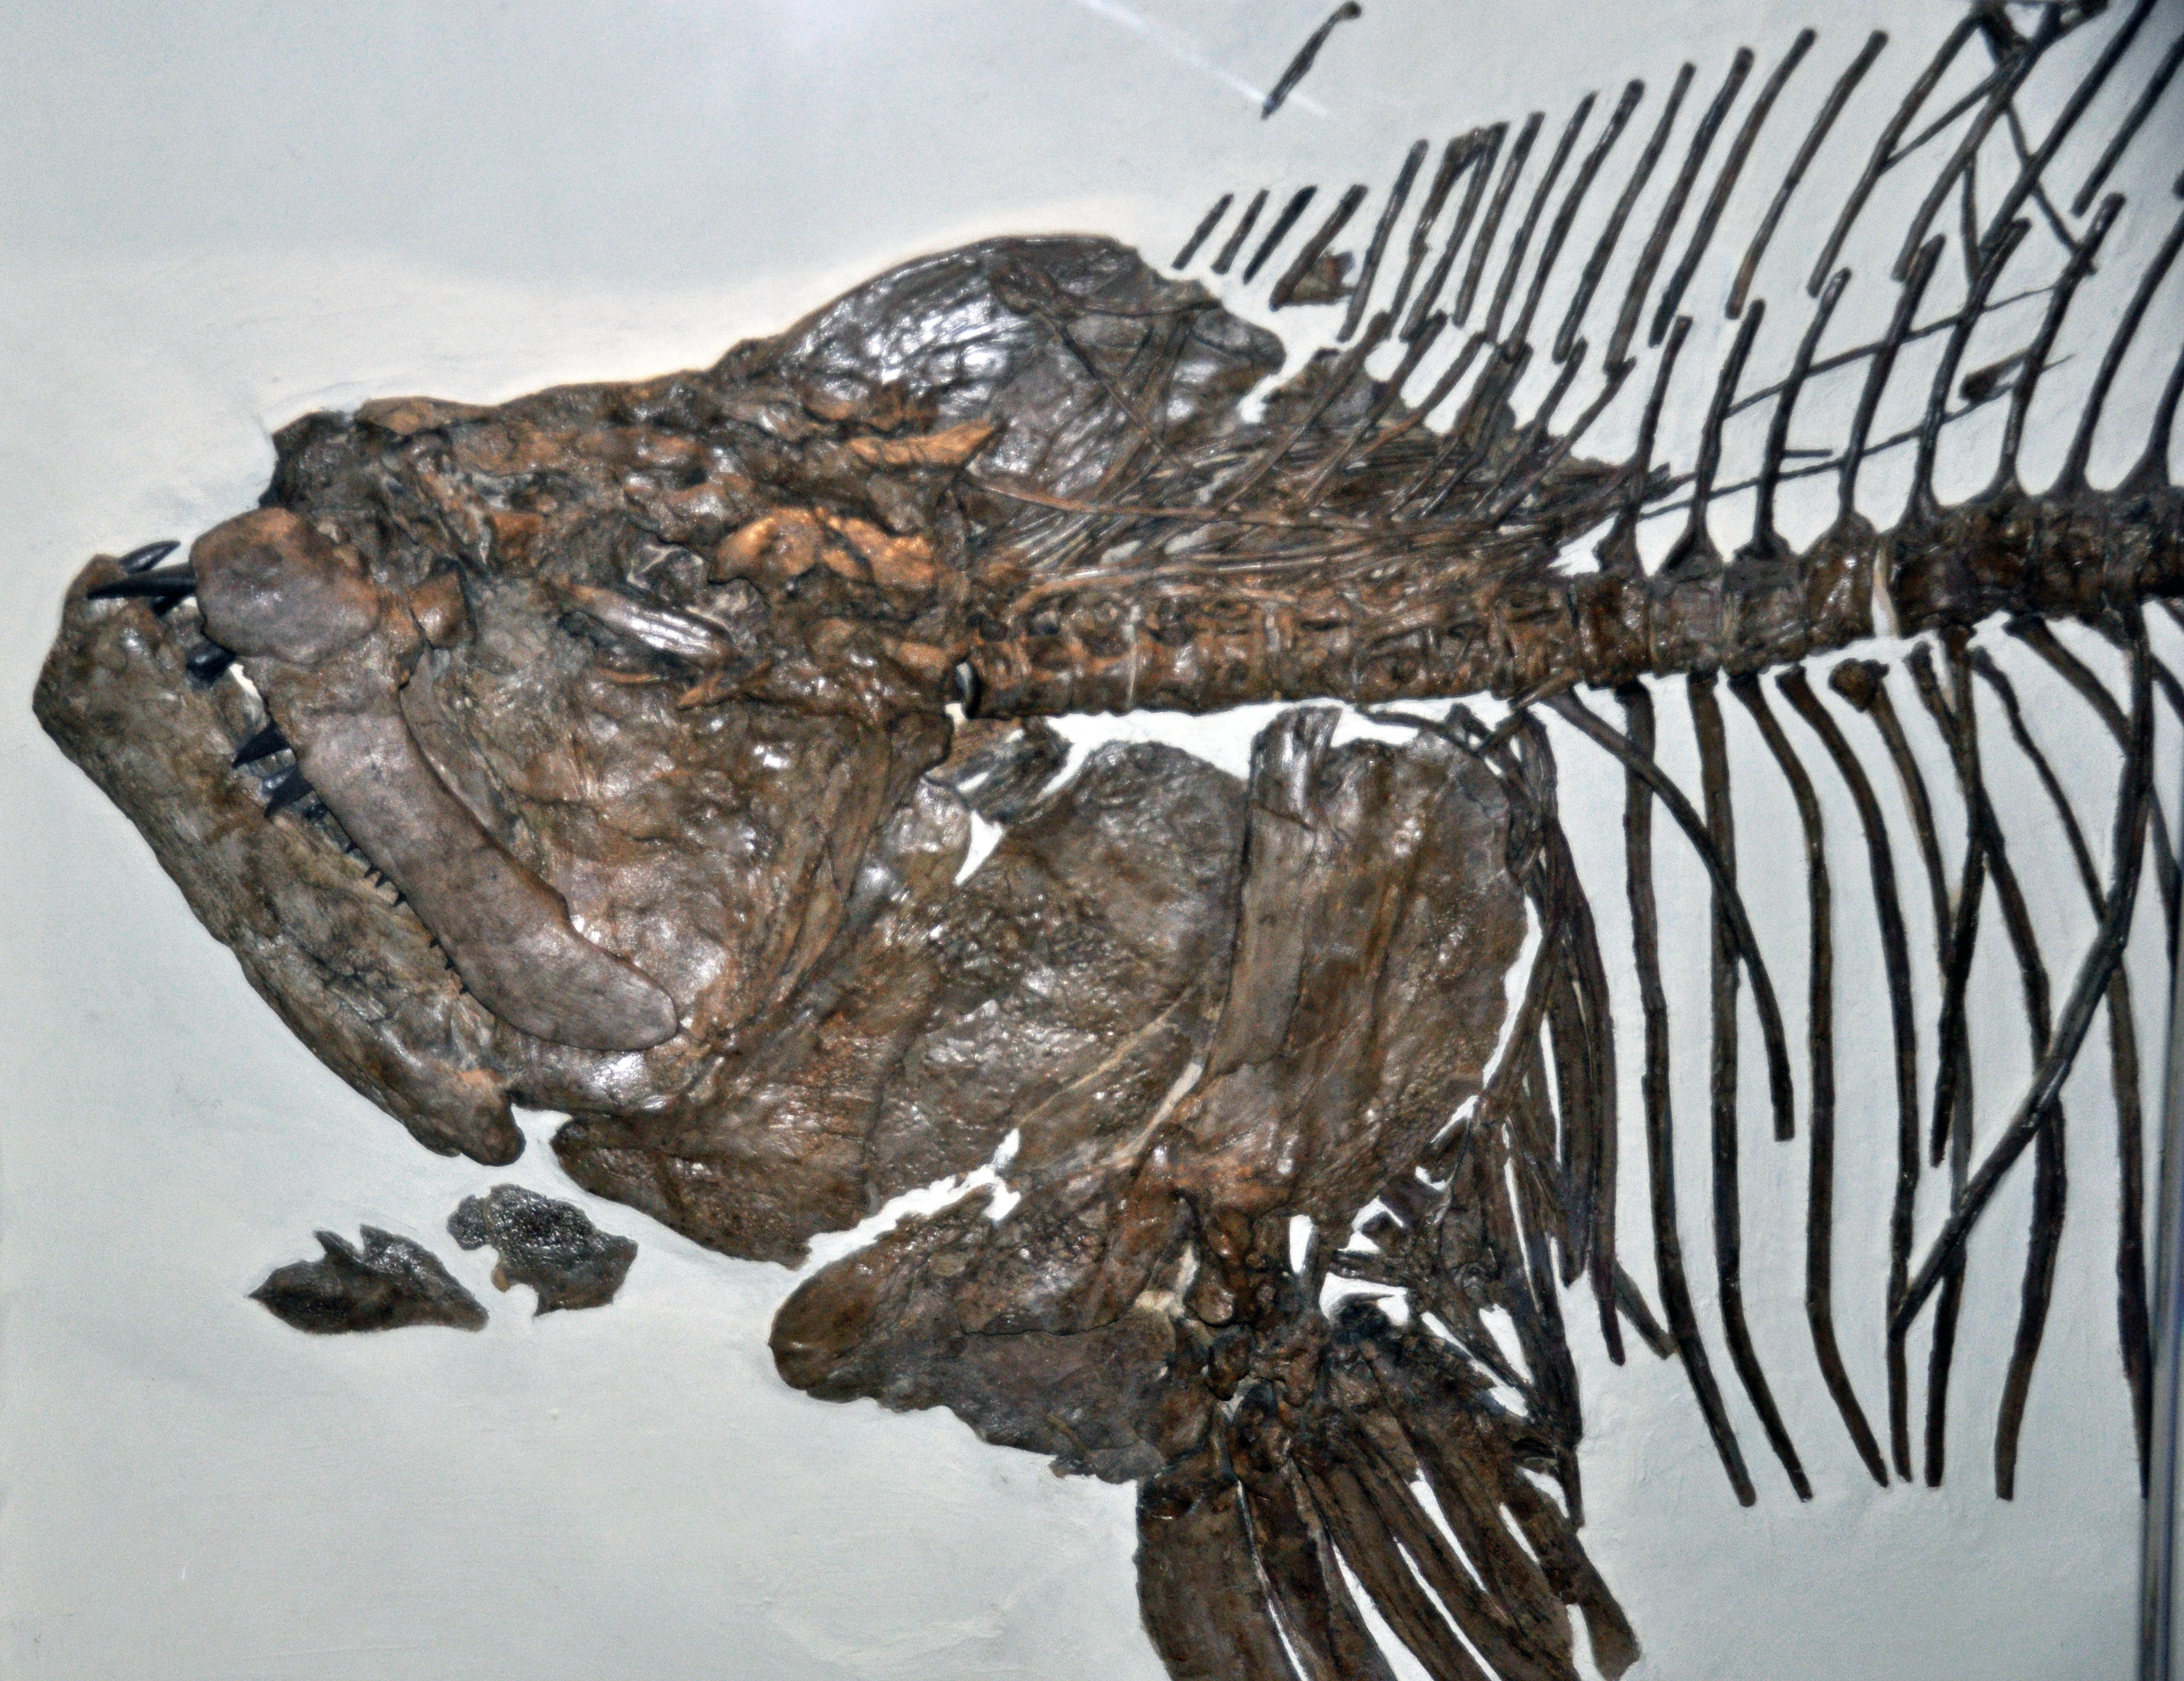 Xiphactinus_audax_%28fossil_fish%29_%28Niobrara_Formation%2C_Upper_Cretaceous%3B_western_Kansas%2C_USA%29_7_%2833625274972%29.jpg